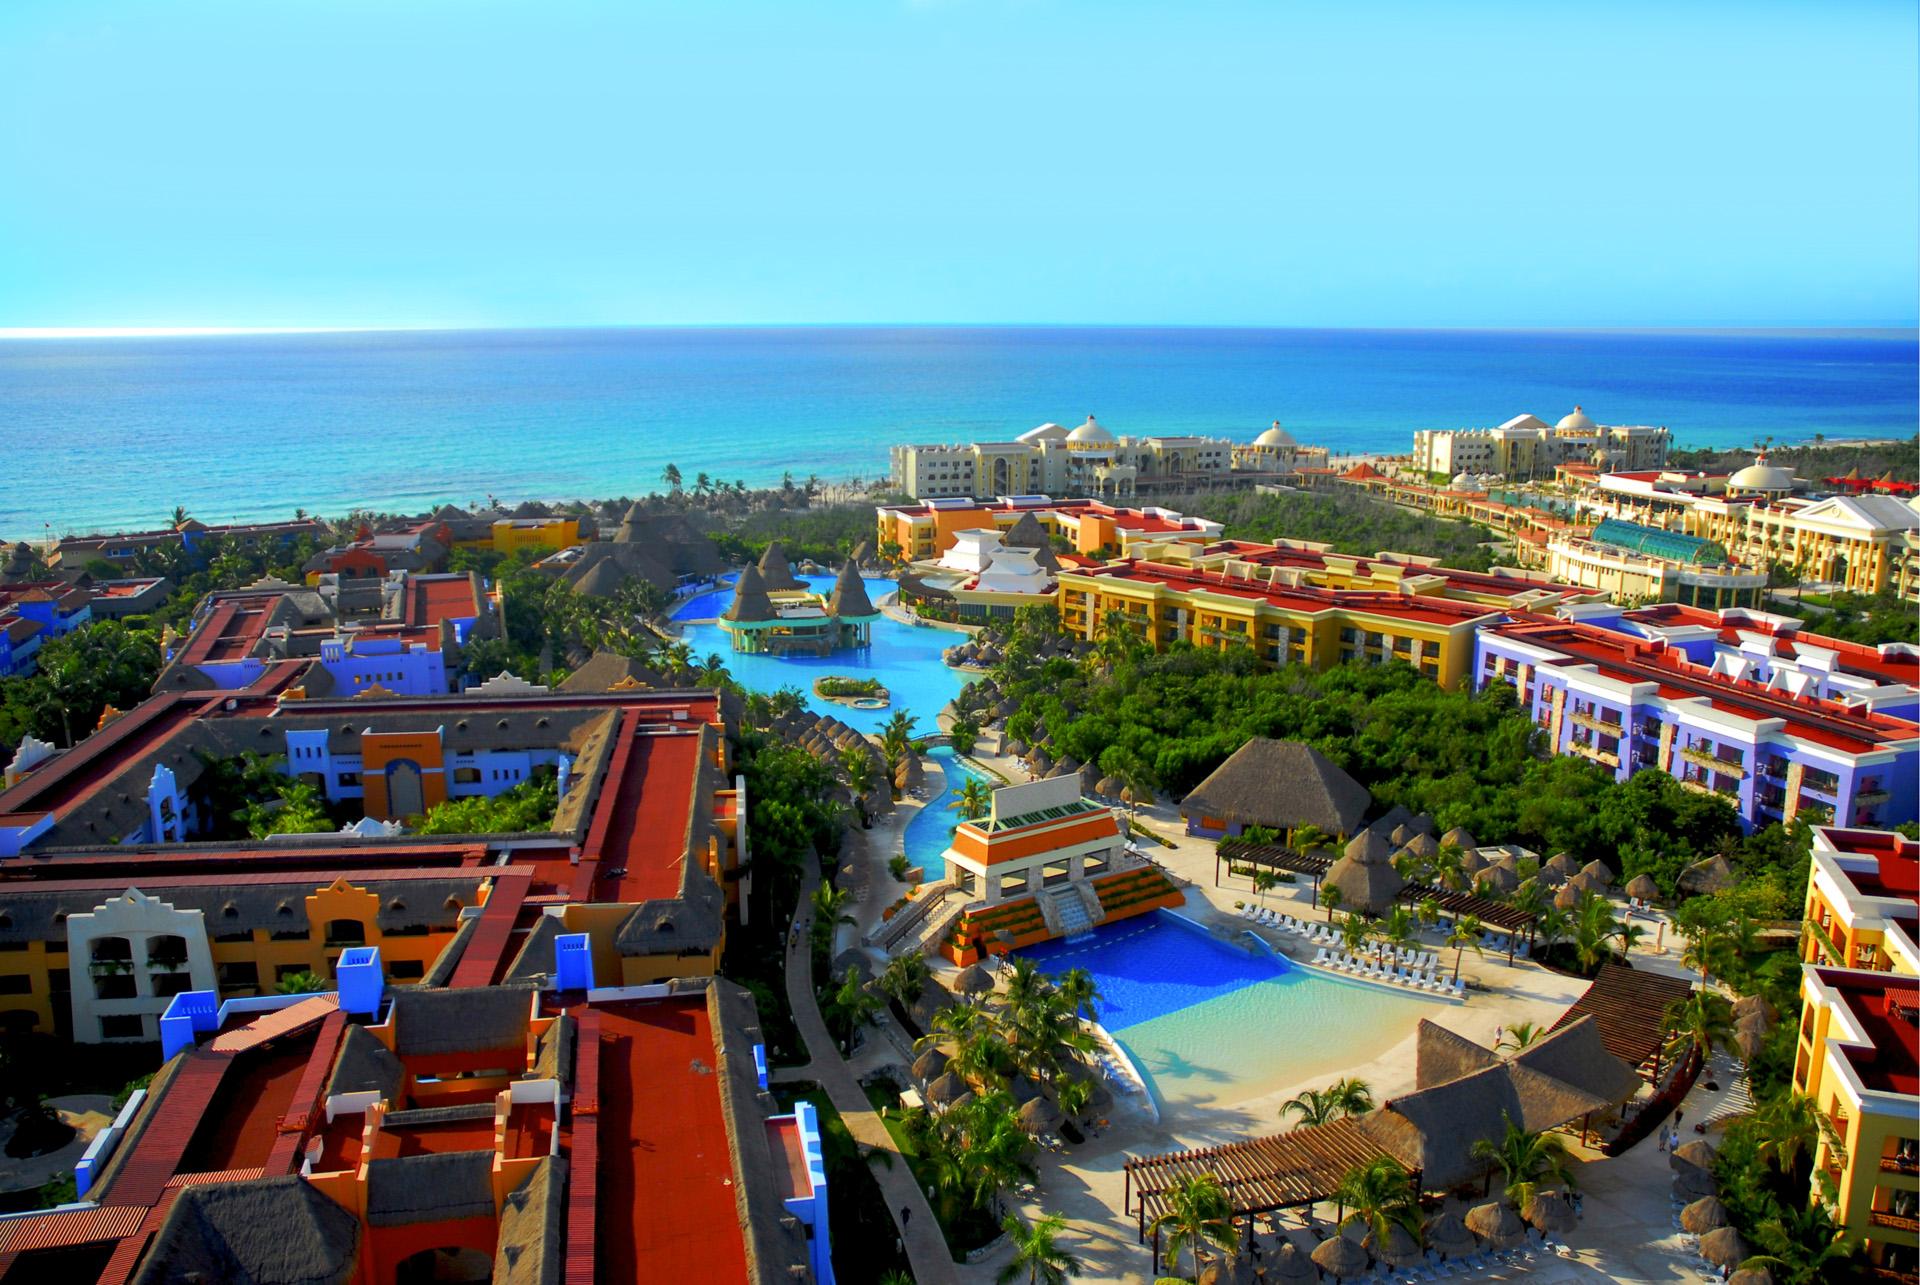 https://imacoponline.com/1-sistema/galeria/panoramicas/9483728589783387521Panoramica-Hotel-portada.jpg